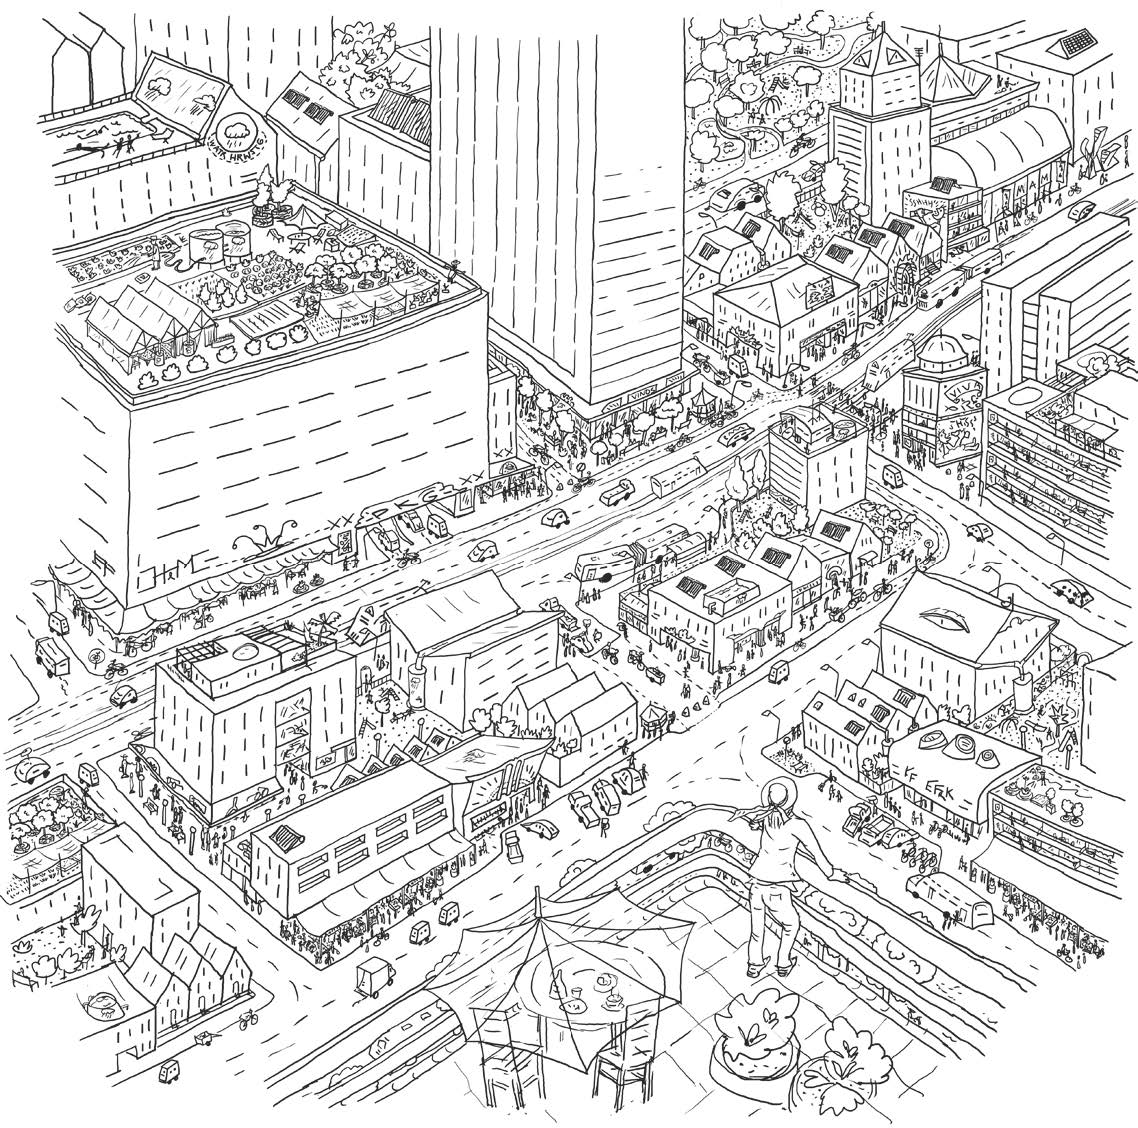 Un habitat urban planning and design branch portfolio - What is urban planning and design ...